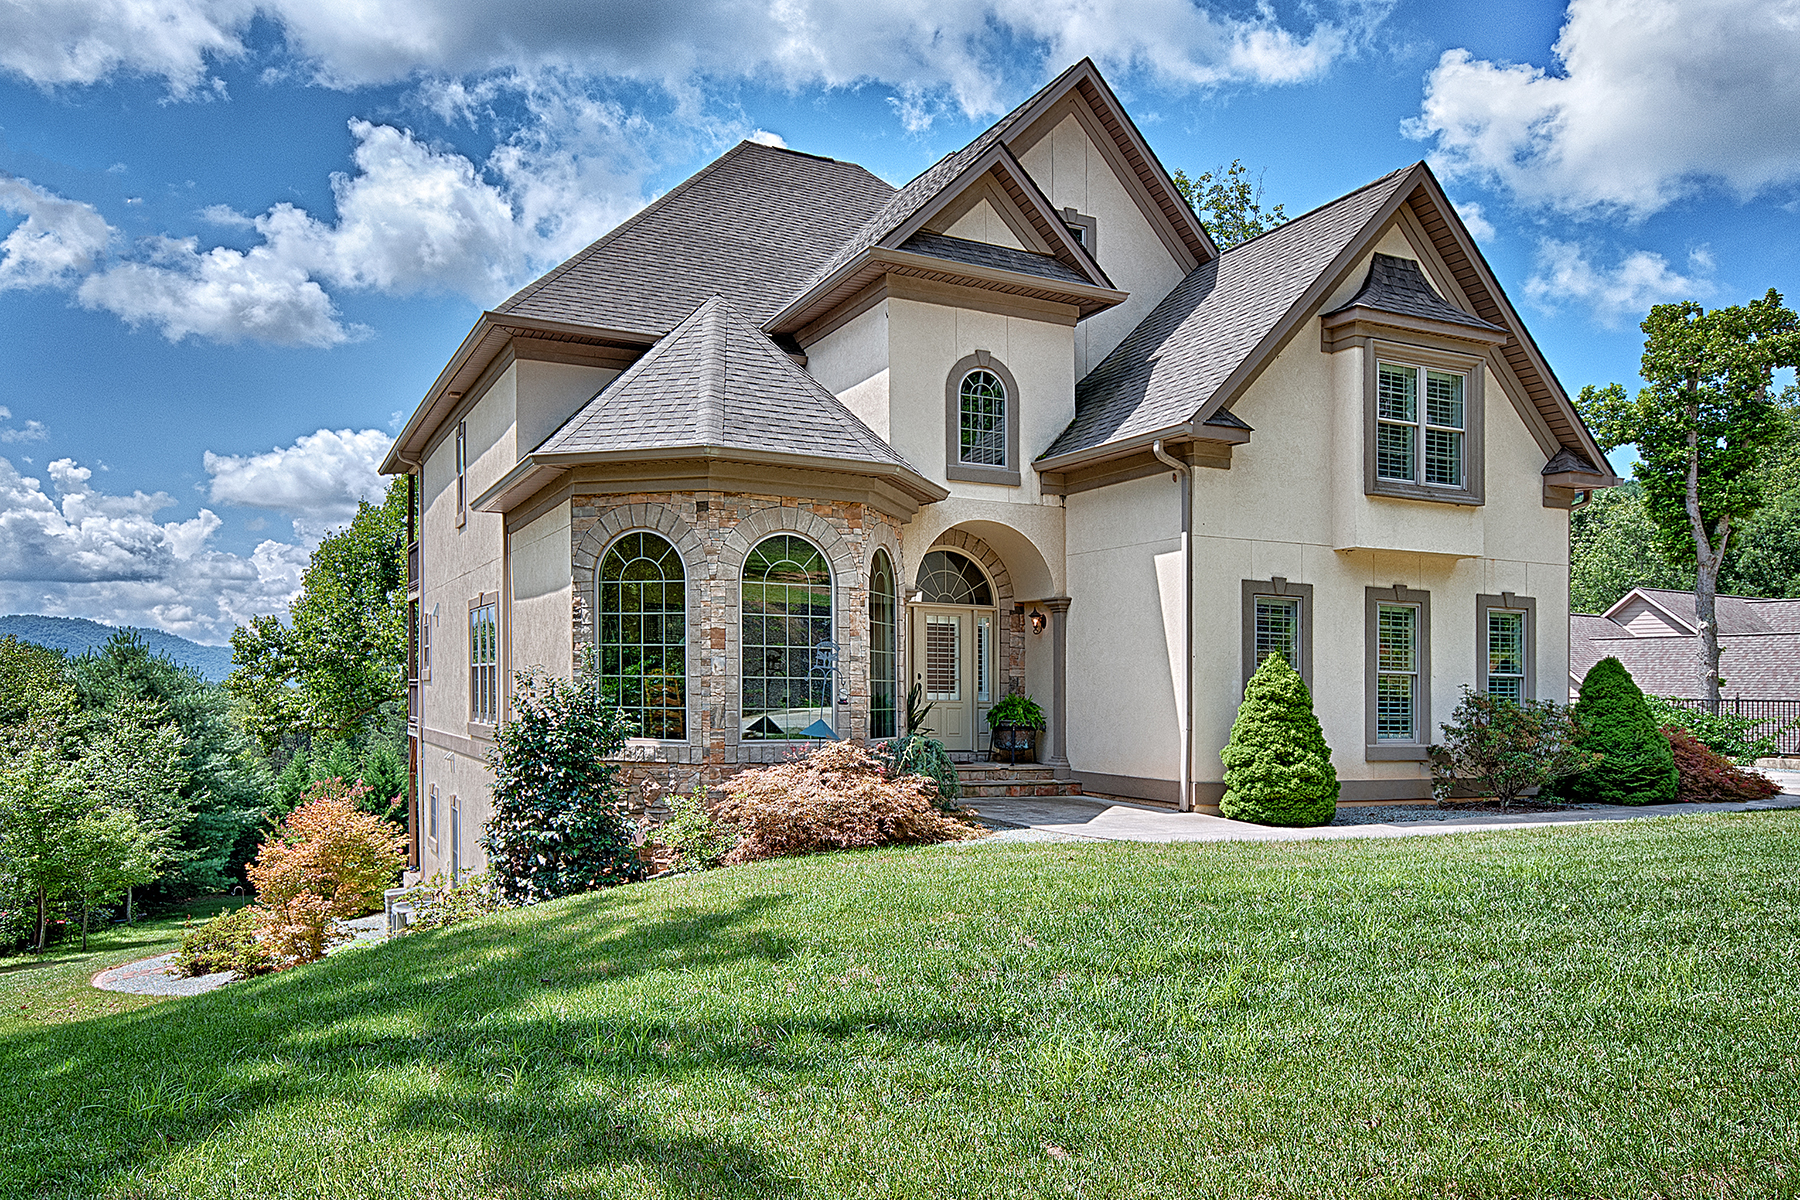 Single Family Home for Sale at TRILLIUM GLEN 132 Glen Trillium Dr Fletcher, North Carolina, 28732 United StatesIn/Around: Asheville